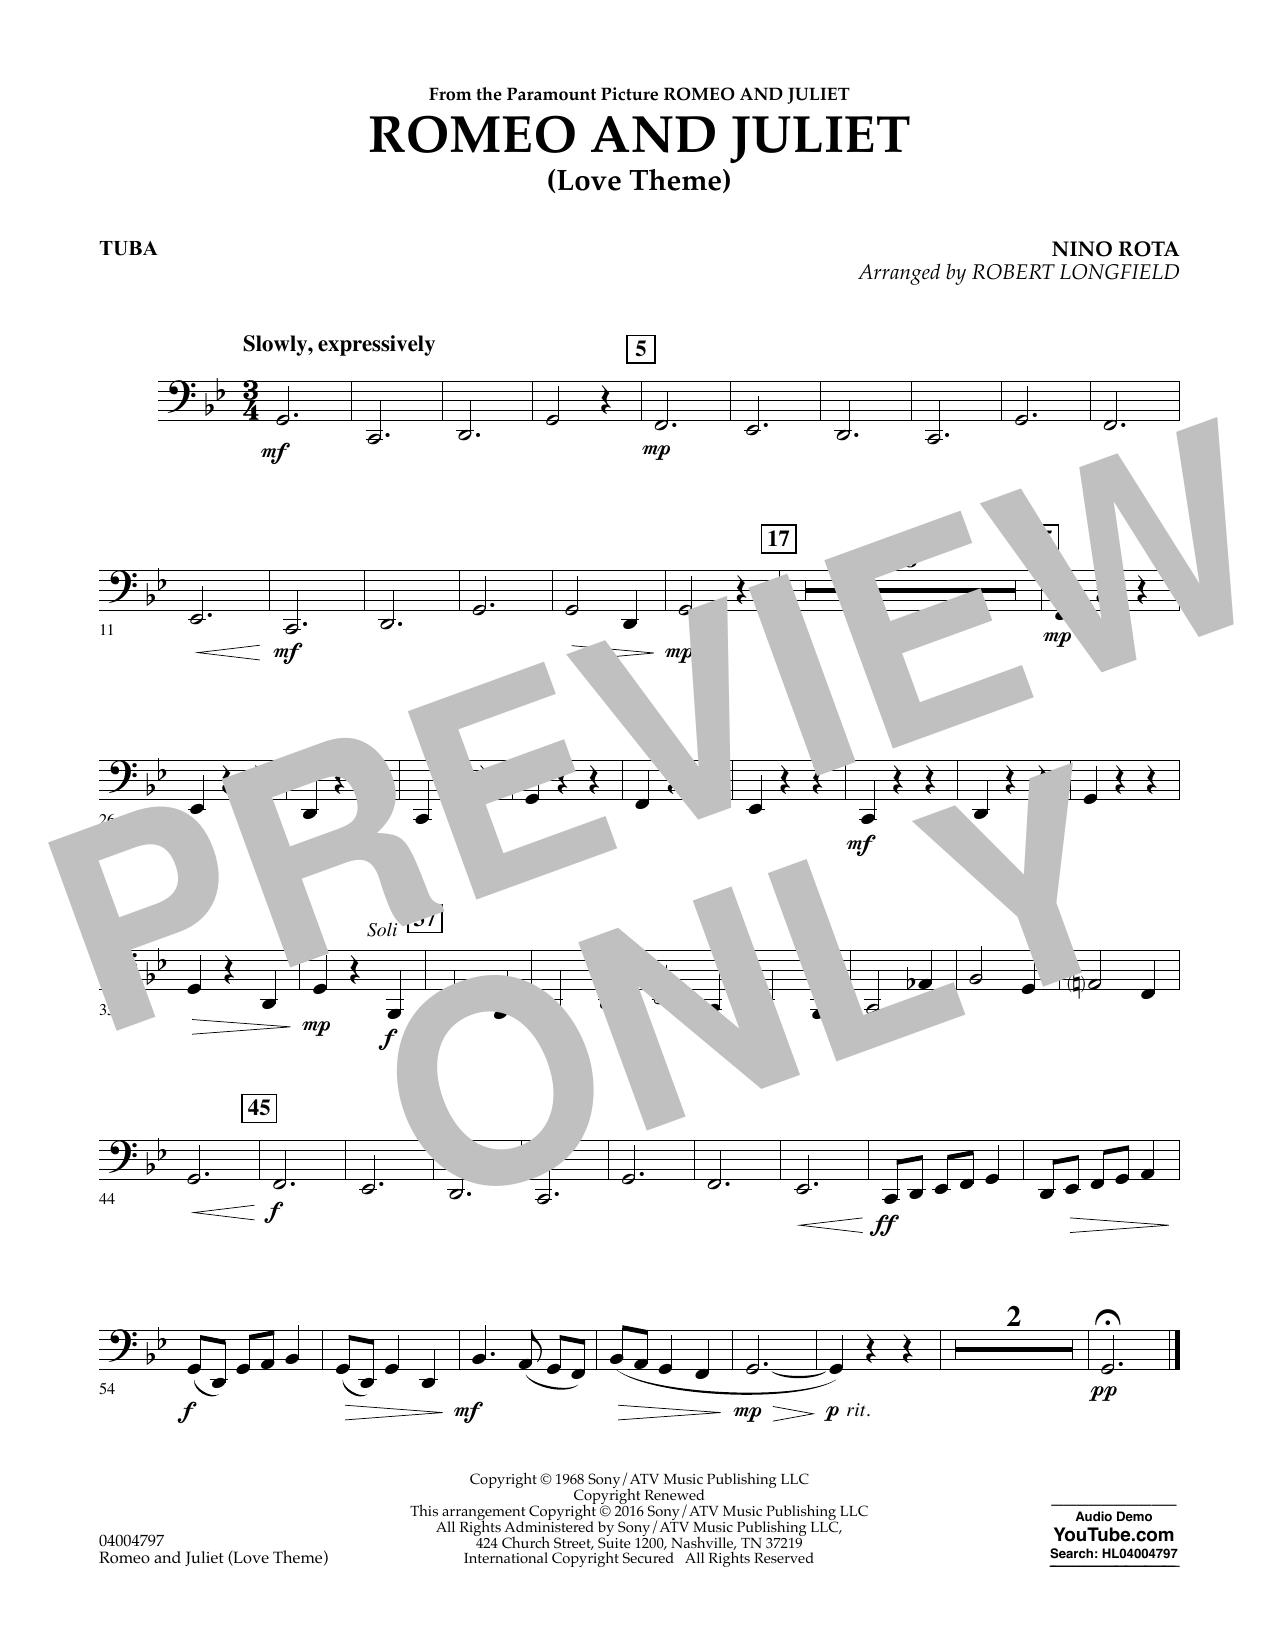 Romeo and Juliet (Love Theme) - Tuba (Concert Band)